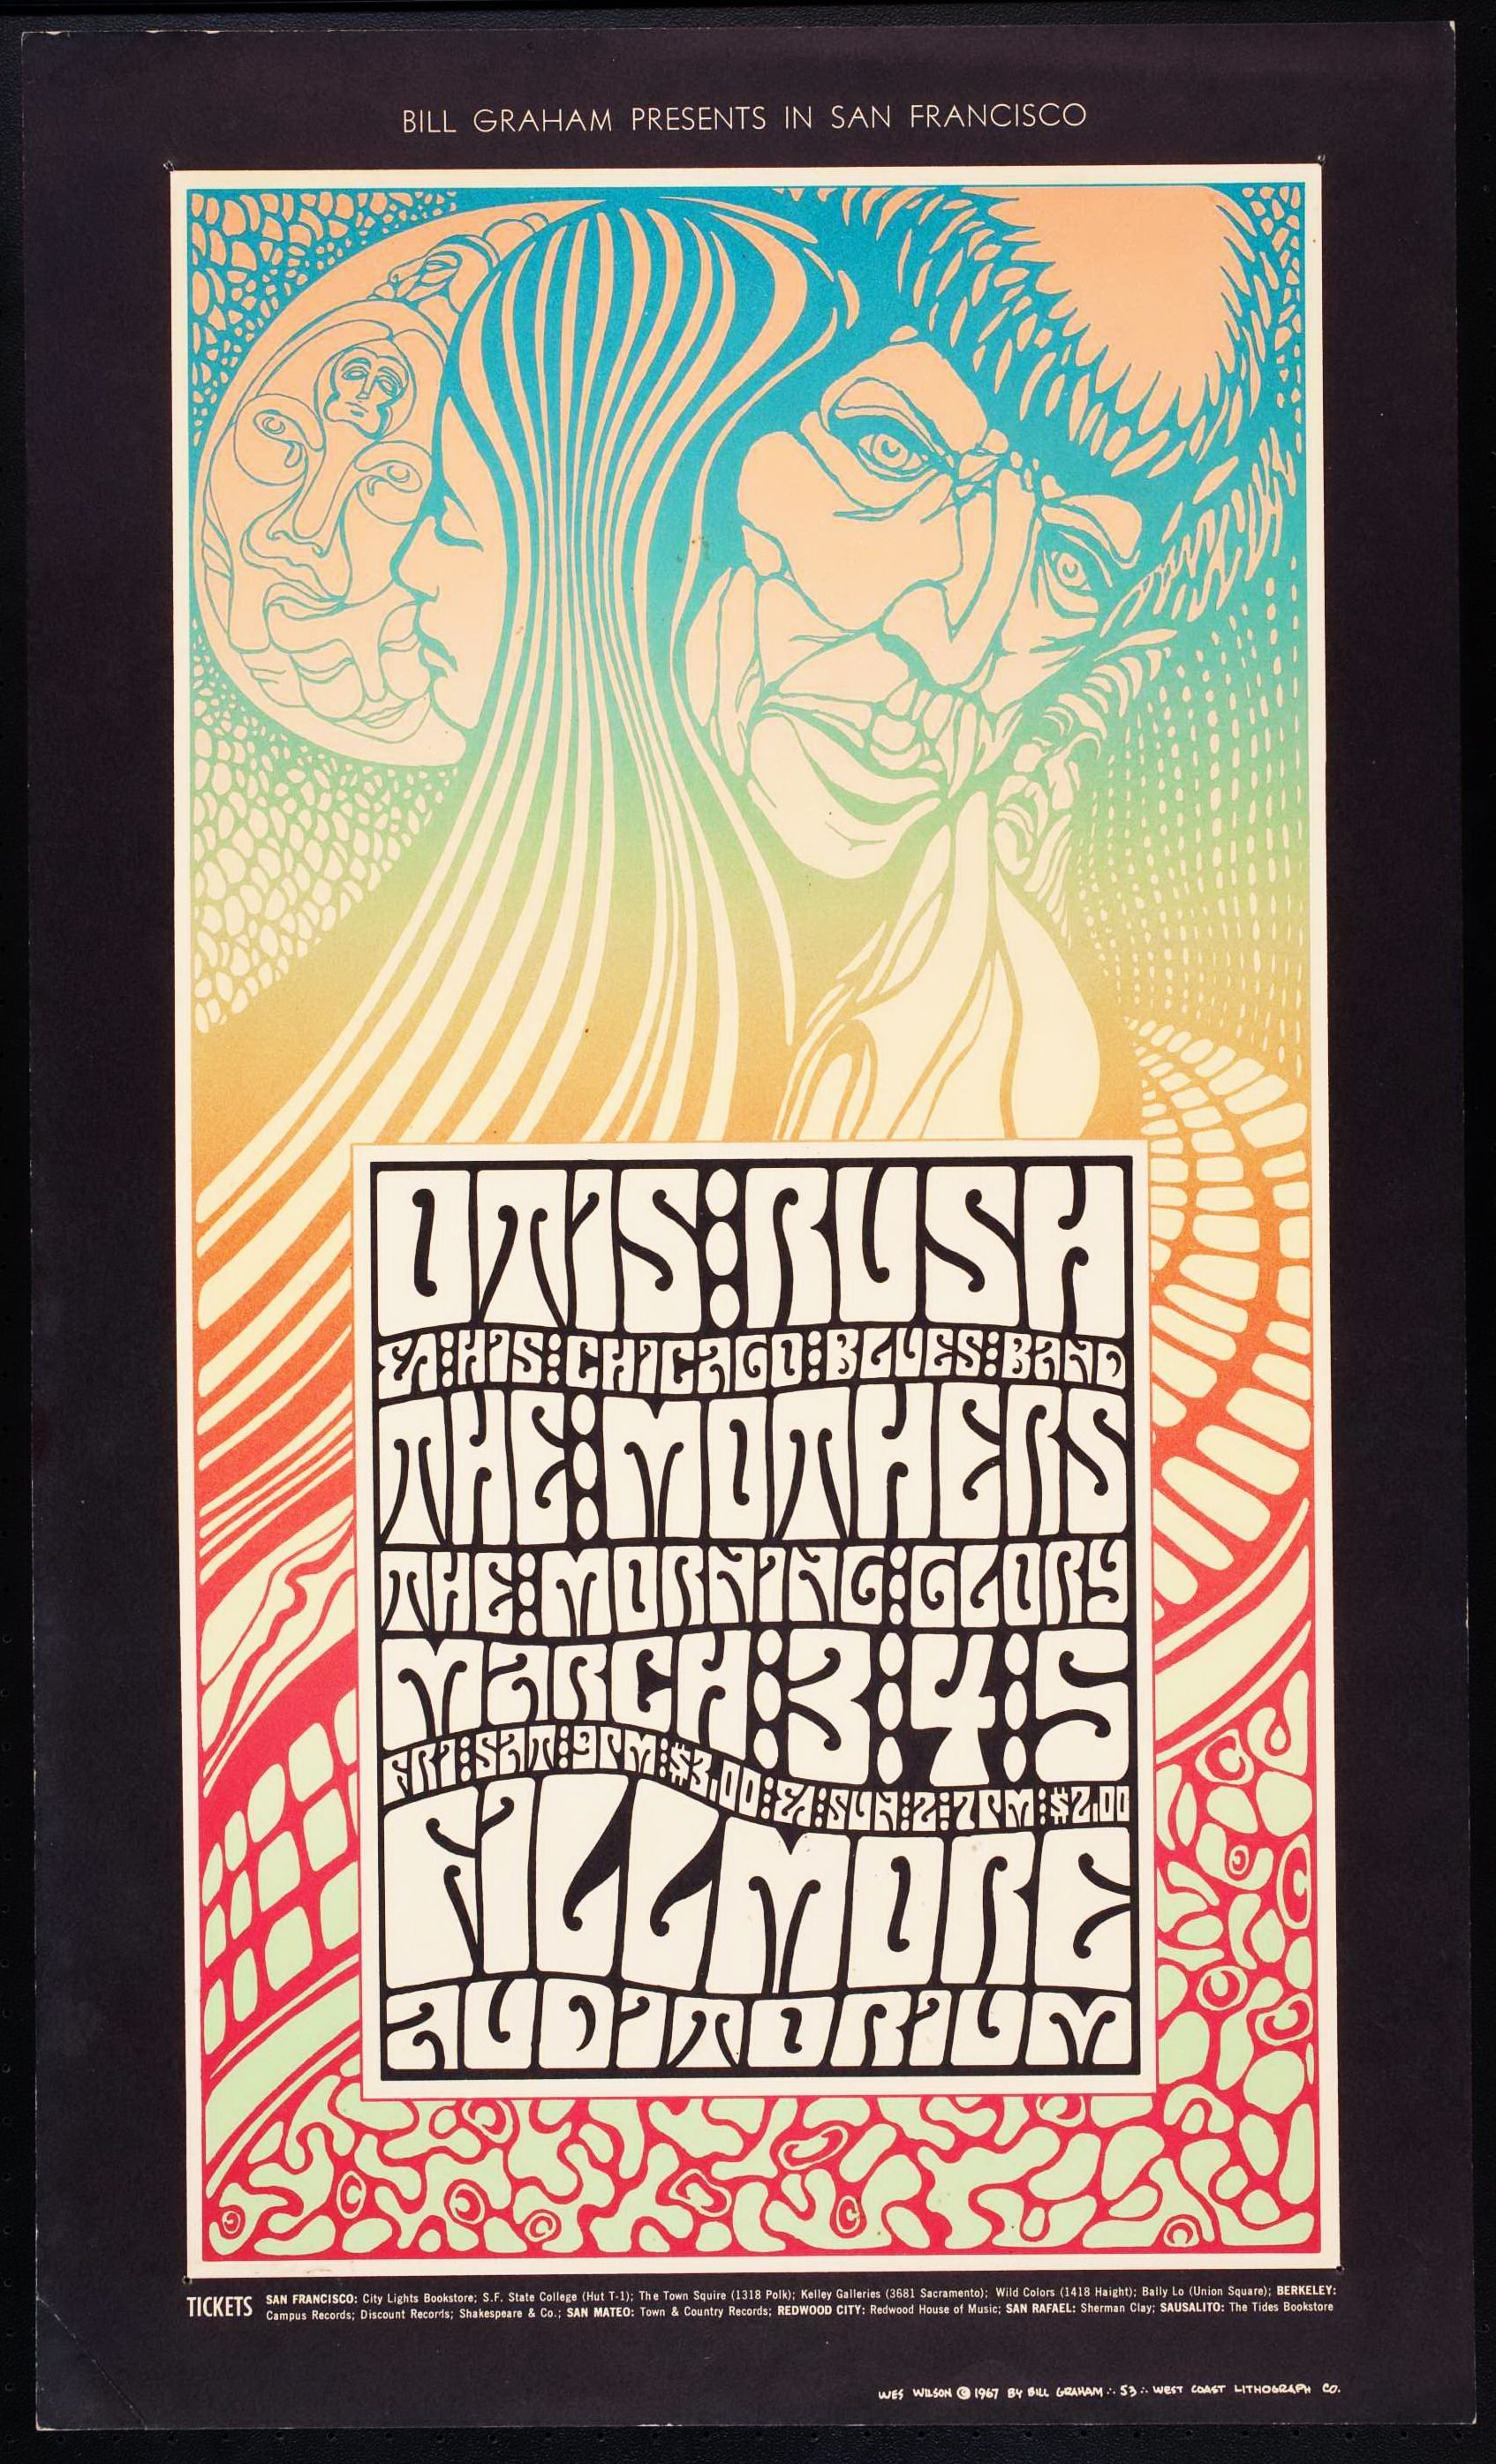 Otis Rush, The Mothers fillmore poster